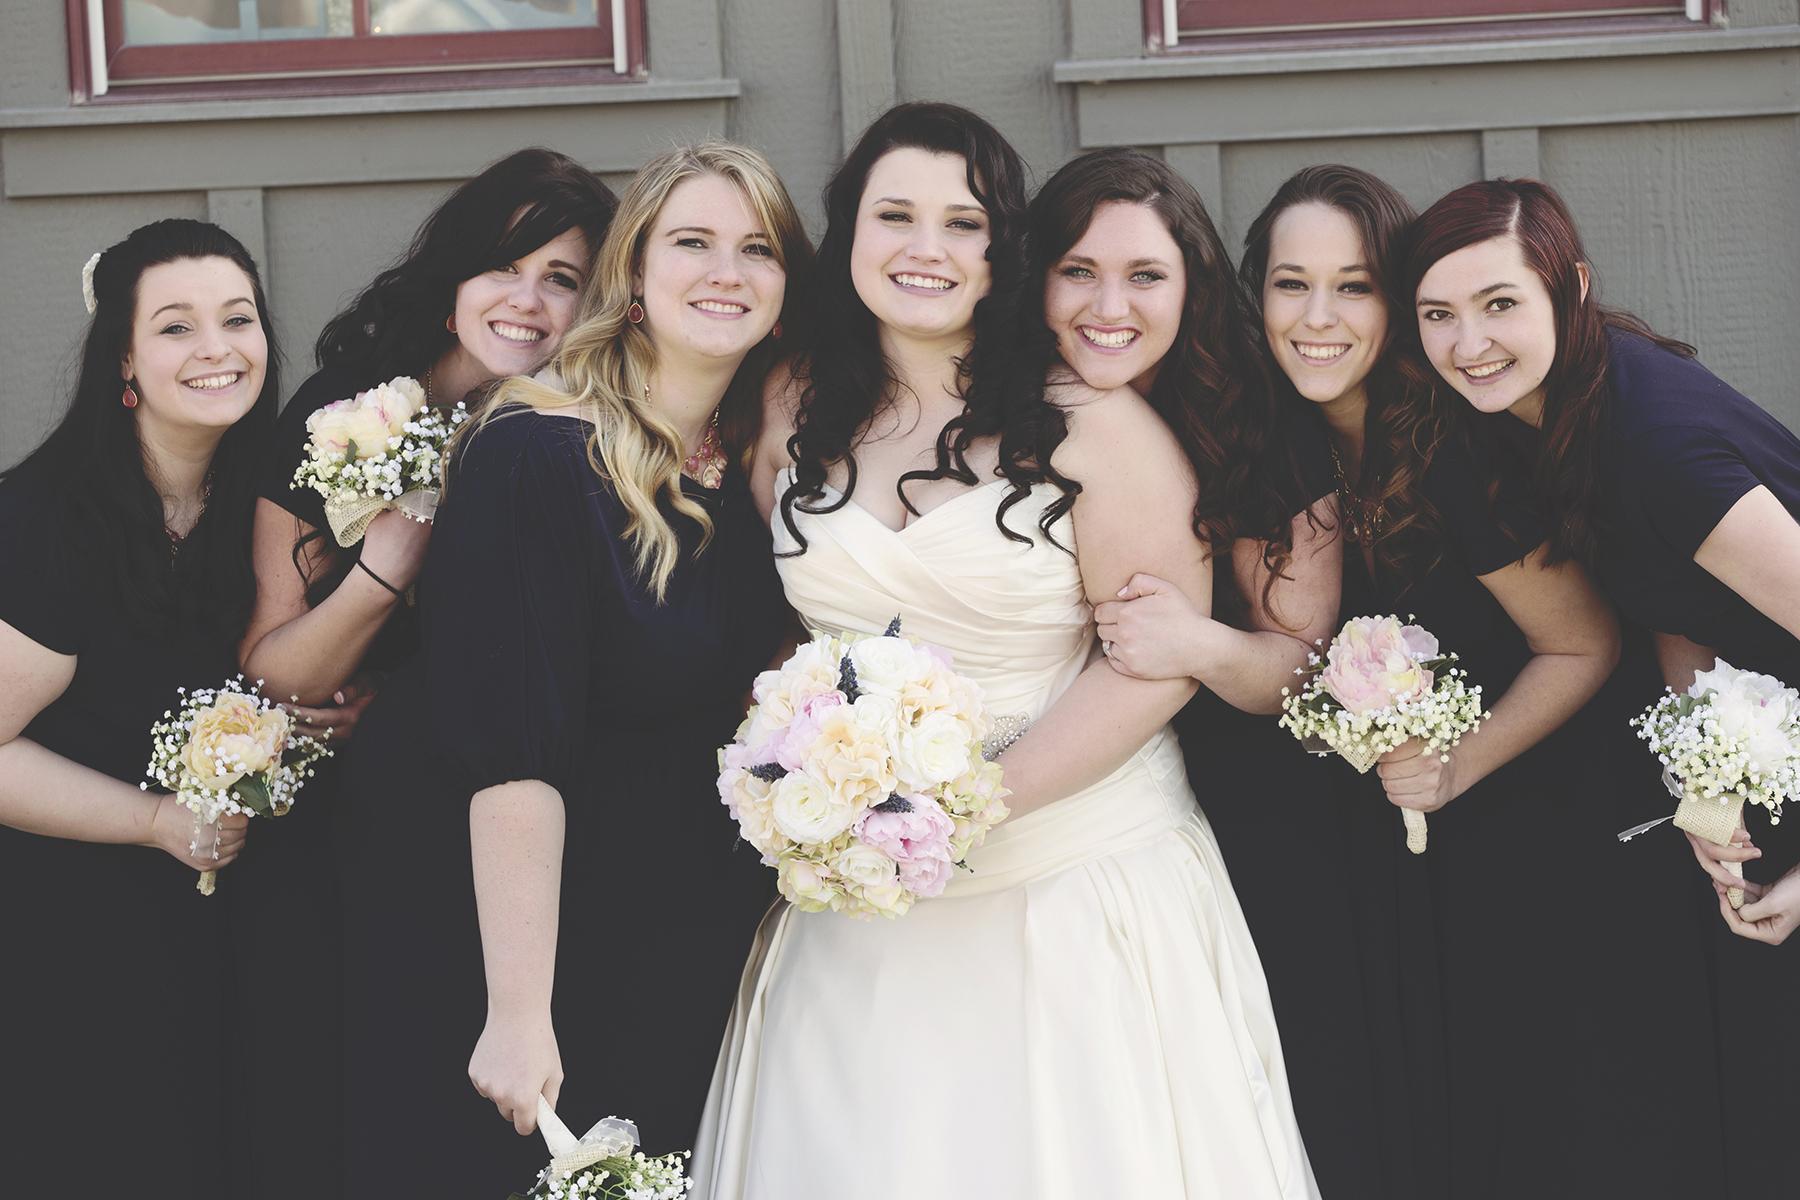 Utah Wedding Ceremony Pictures best friends